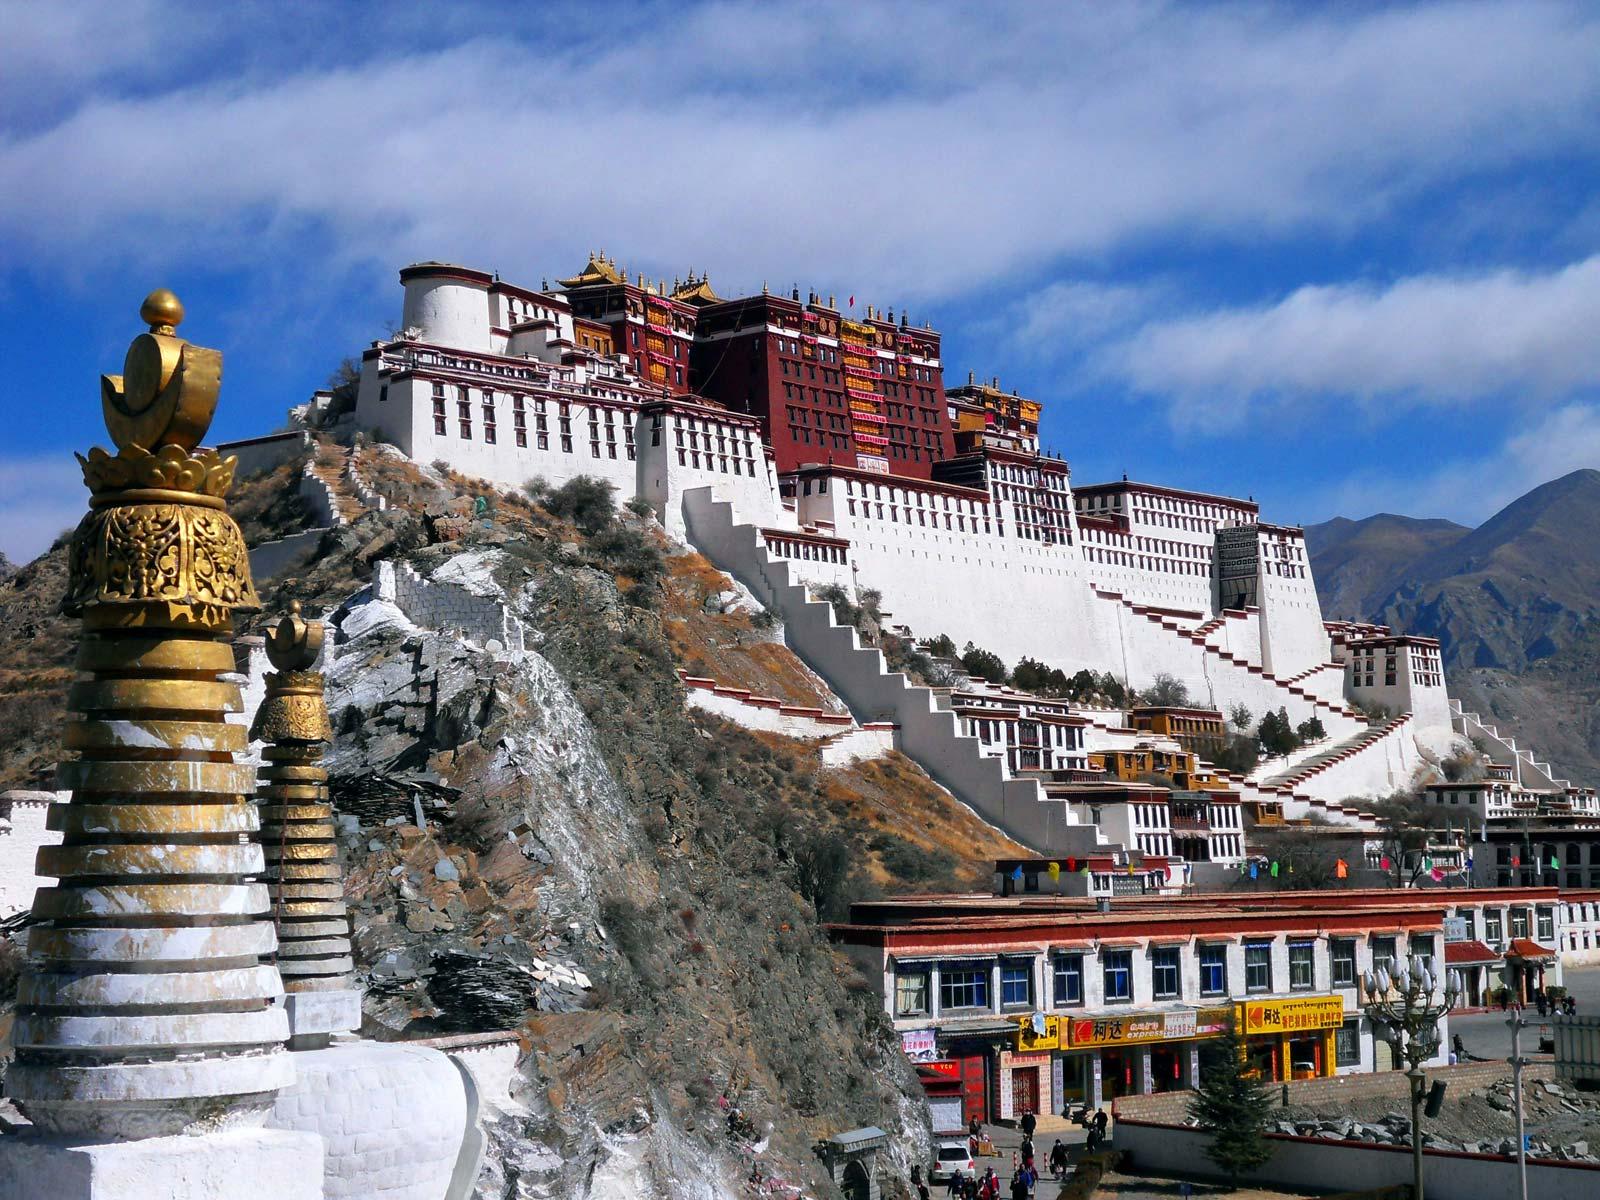 Potala-Palace-Lhasa-China-Tibet-Autonomous-Region